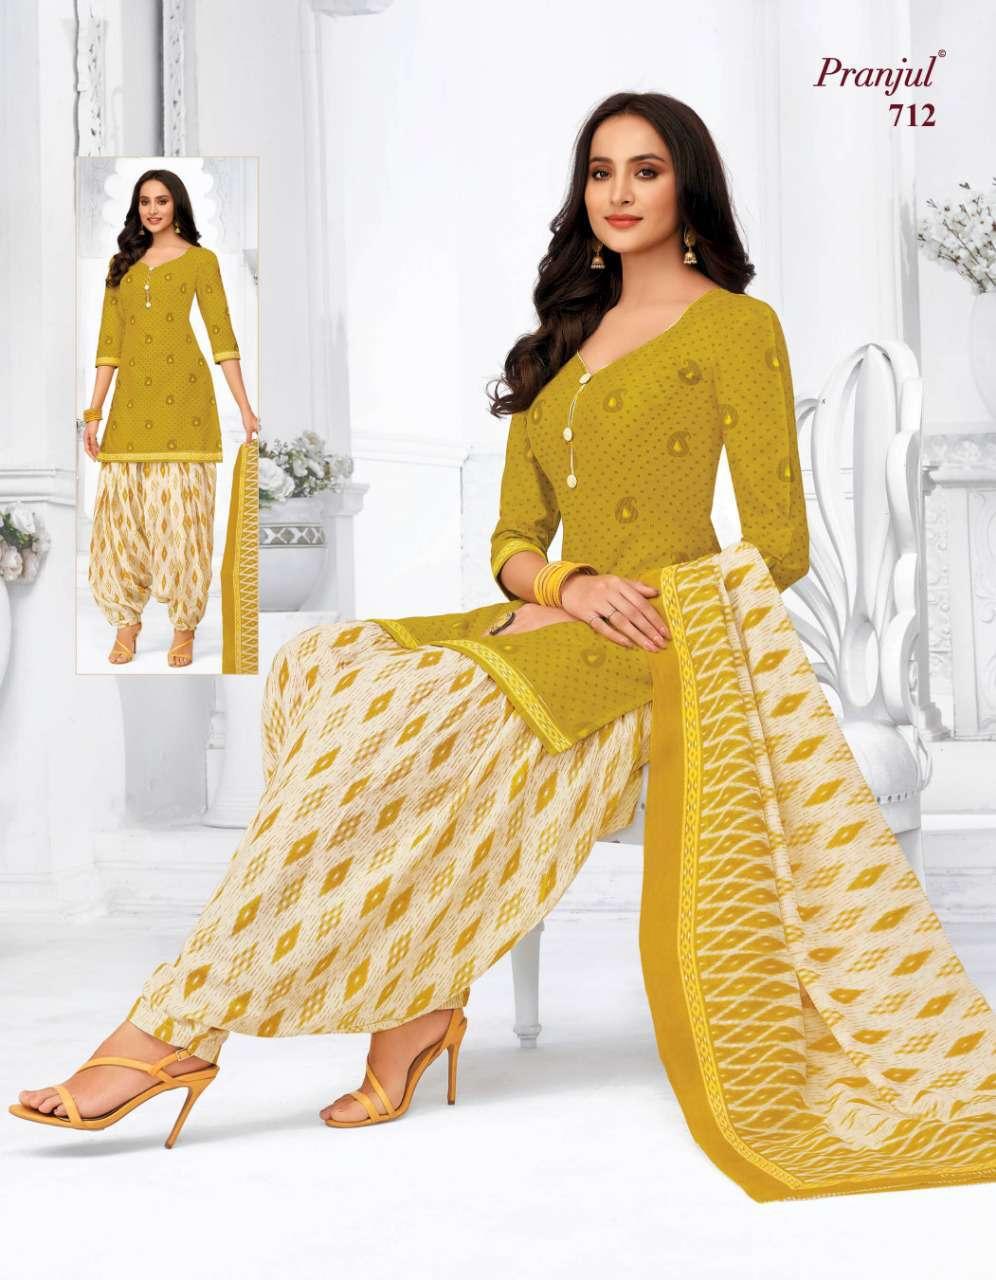 Pranjul Priyanka Vol 7 A Premium Collection Unstitched Suit Wholesale Catalog 18 Pcs 9 - Pranjul Priyanka Vol 7 A Unstitched Suit Wholesale Catalog 18 Pcs